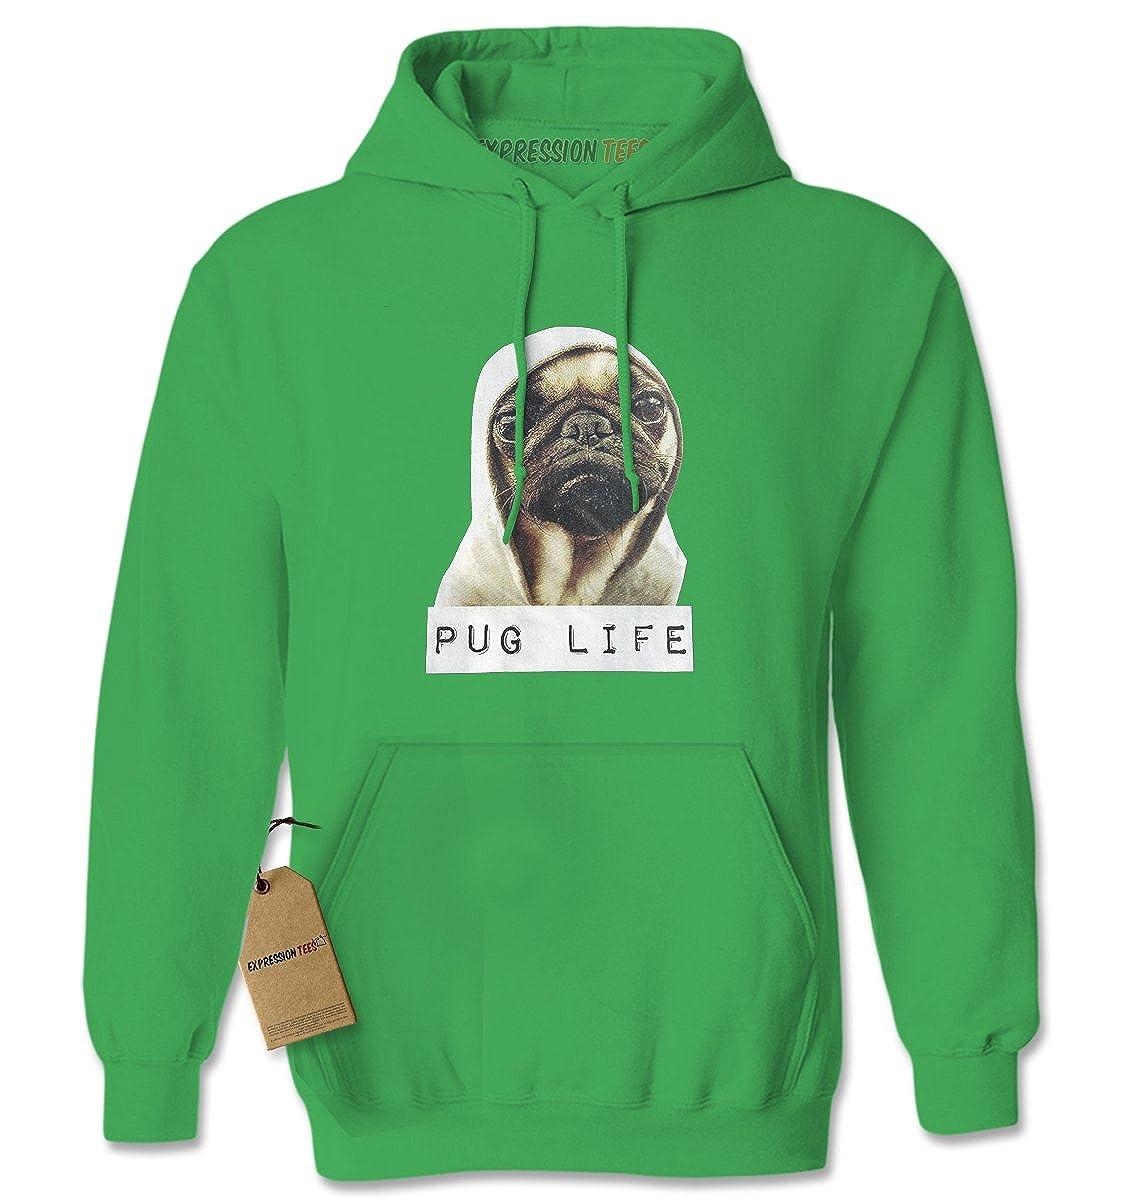 Expression Tees Pug Life Funny Thug Life Unisex Adult Hoodie 9000-H